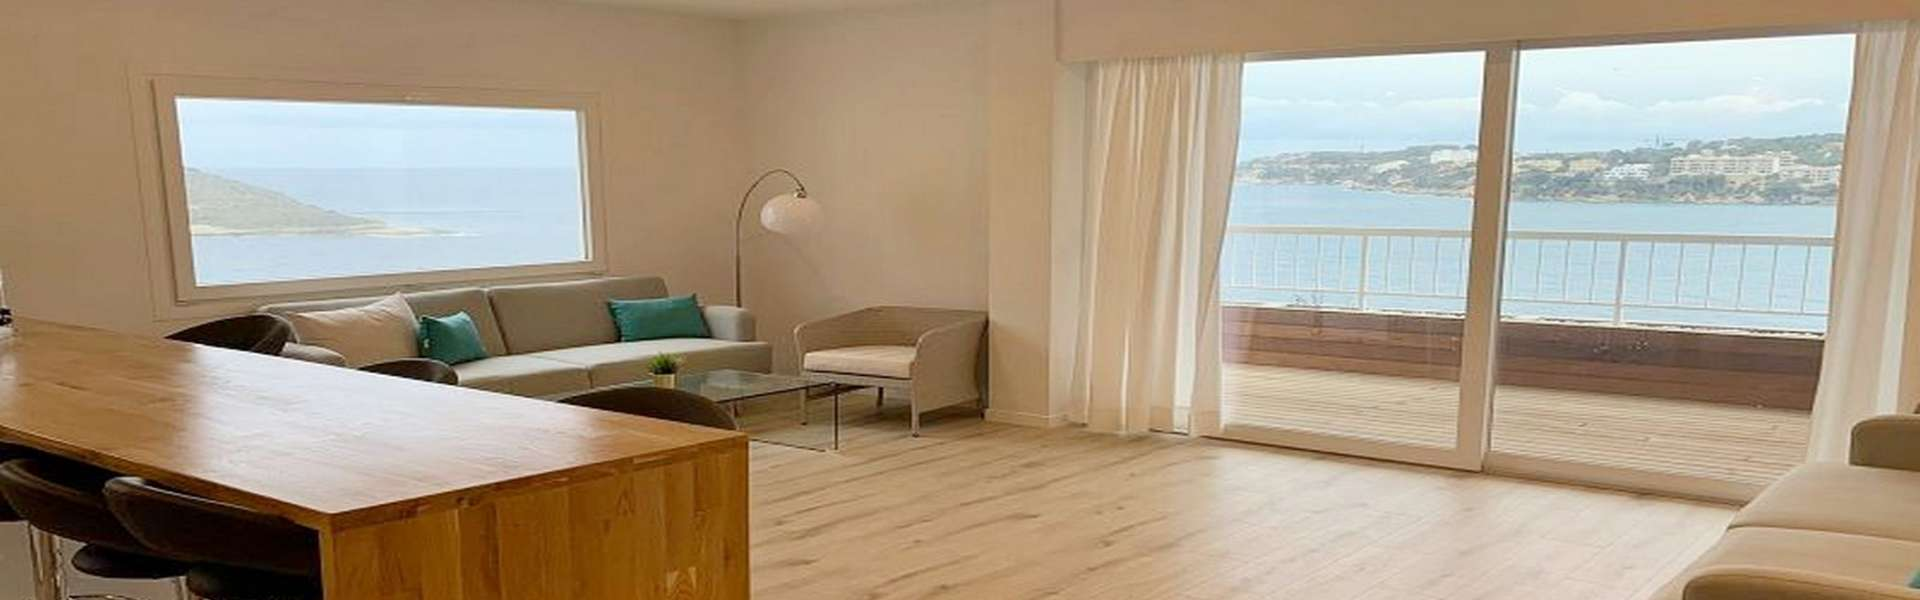 Calvia/Torrenova - Renovated apartment directly by the sea